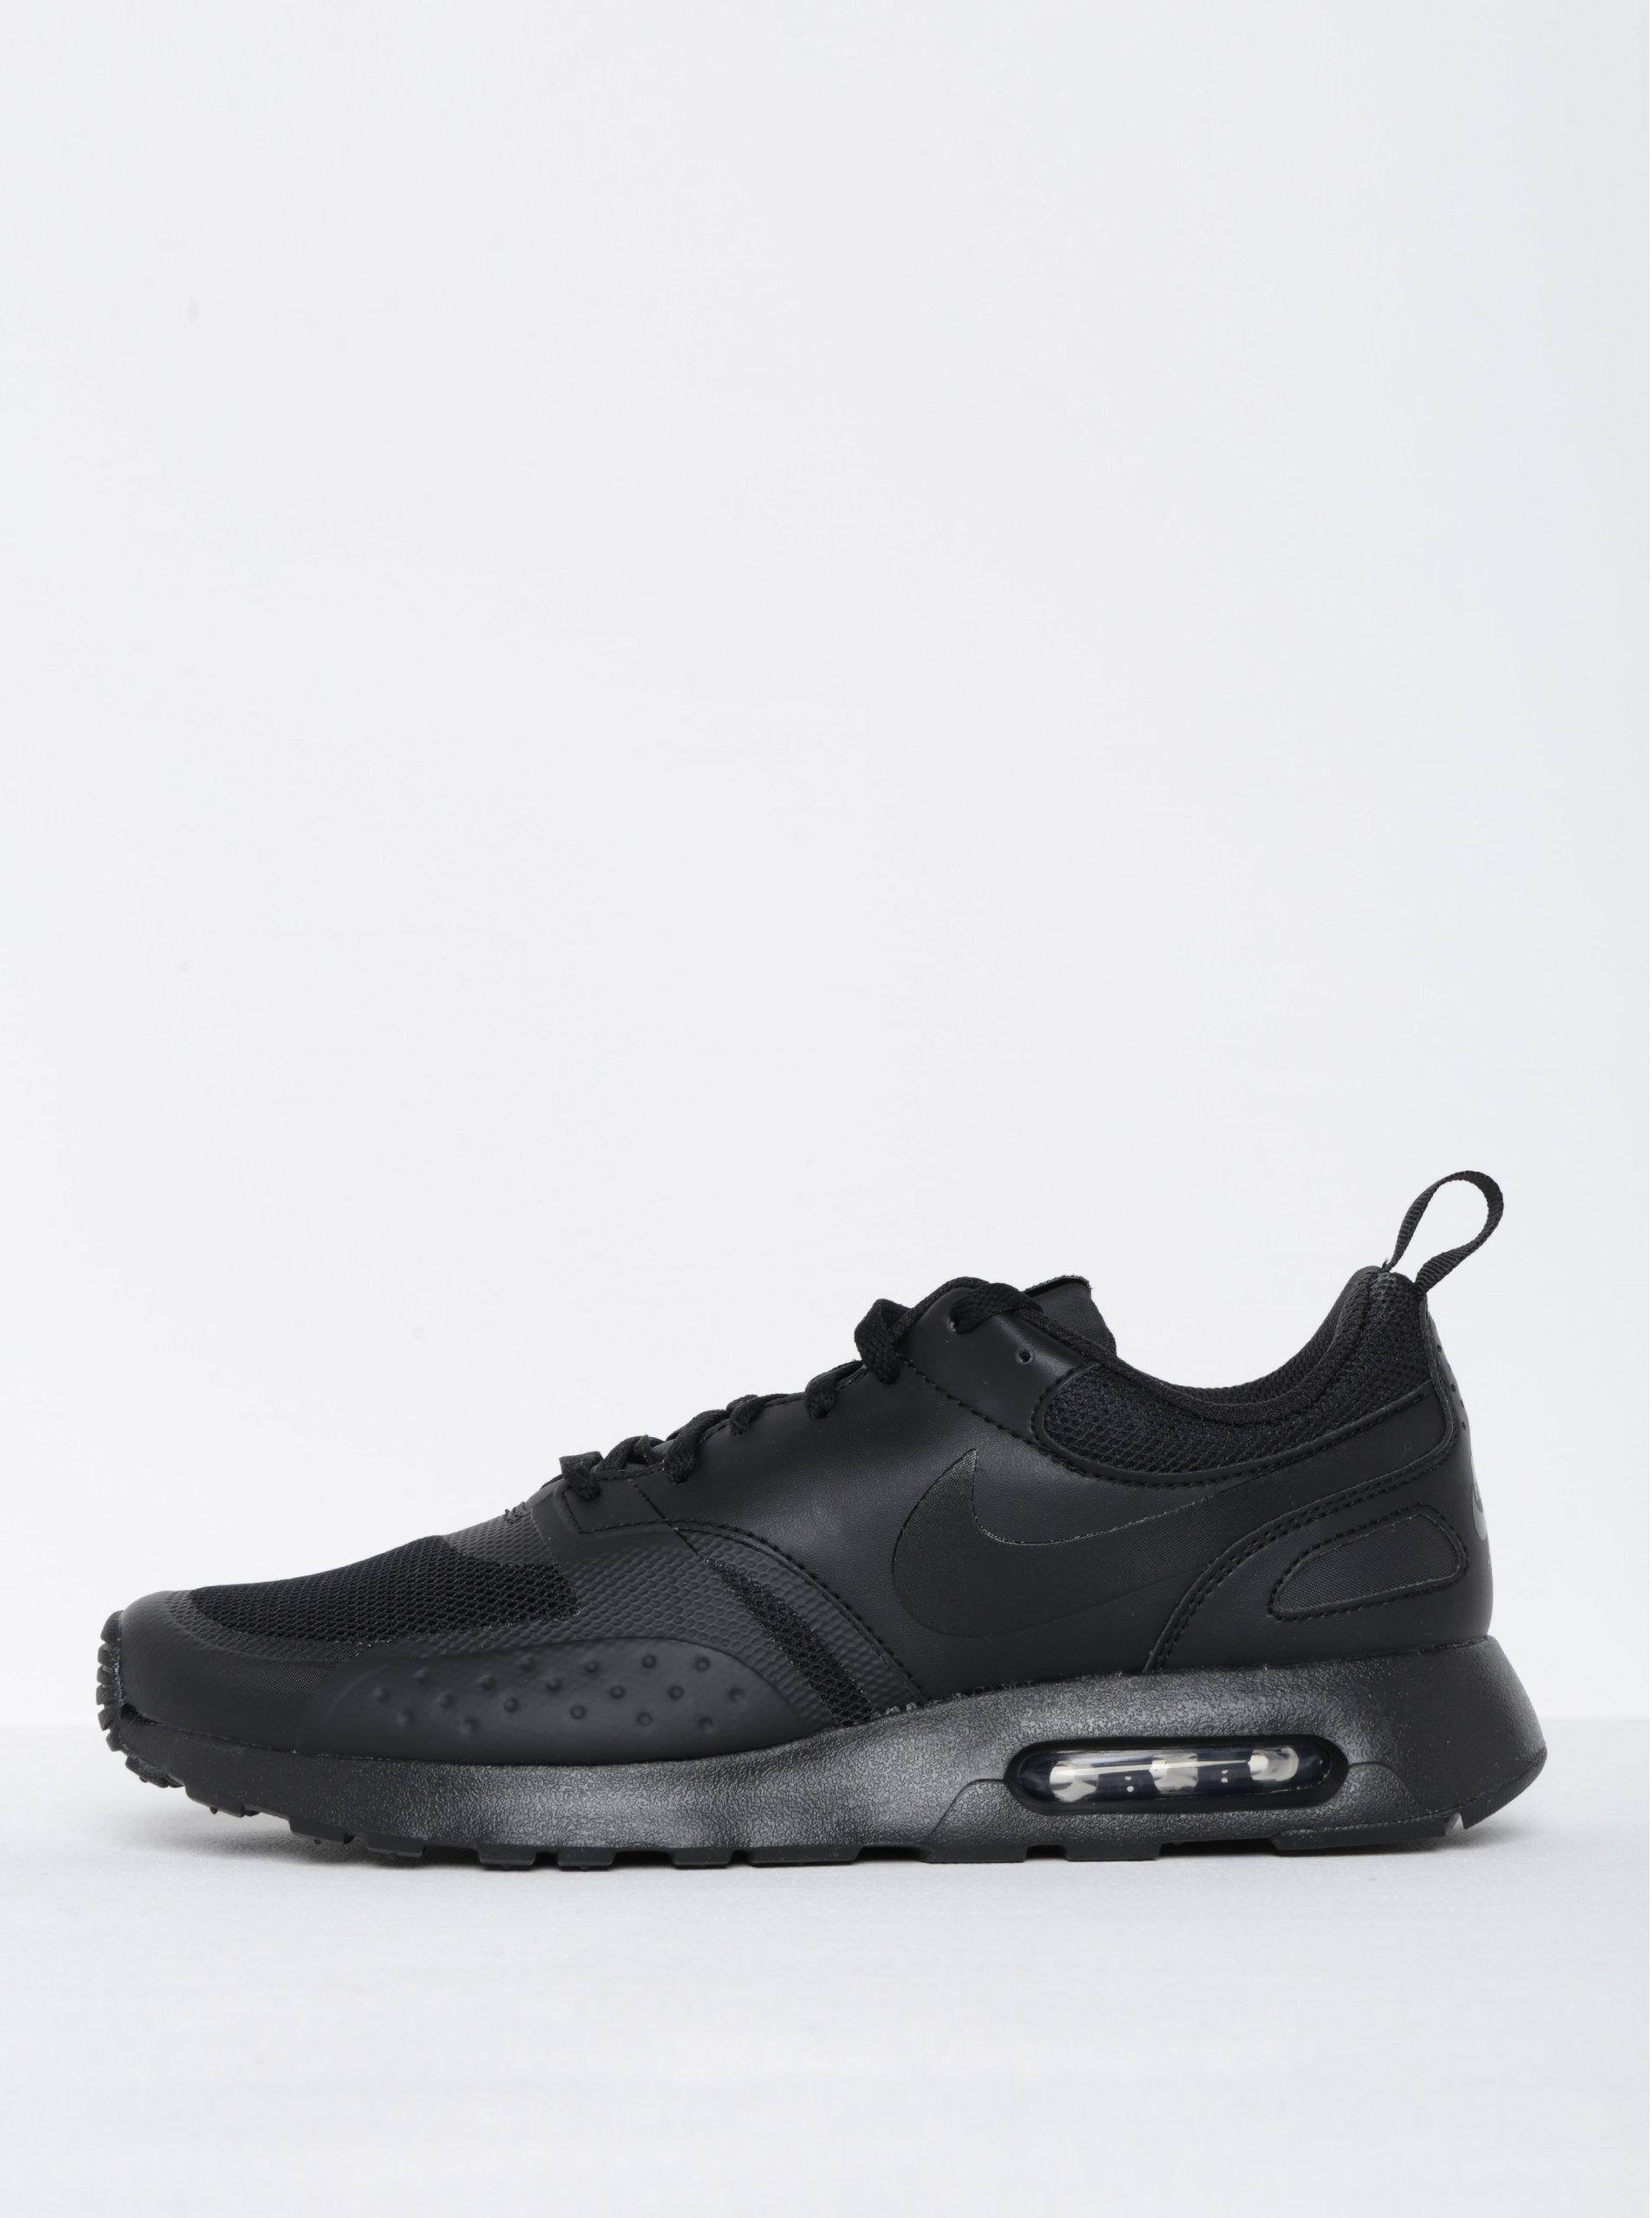 Čierne pánske tenisky Nike Air Max Vision ... 1d1e4091c71